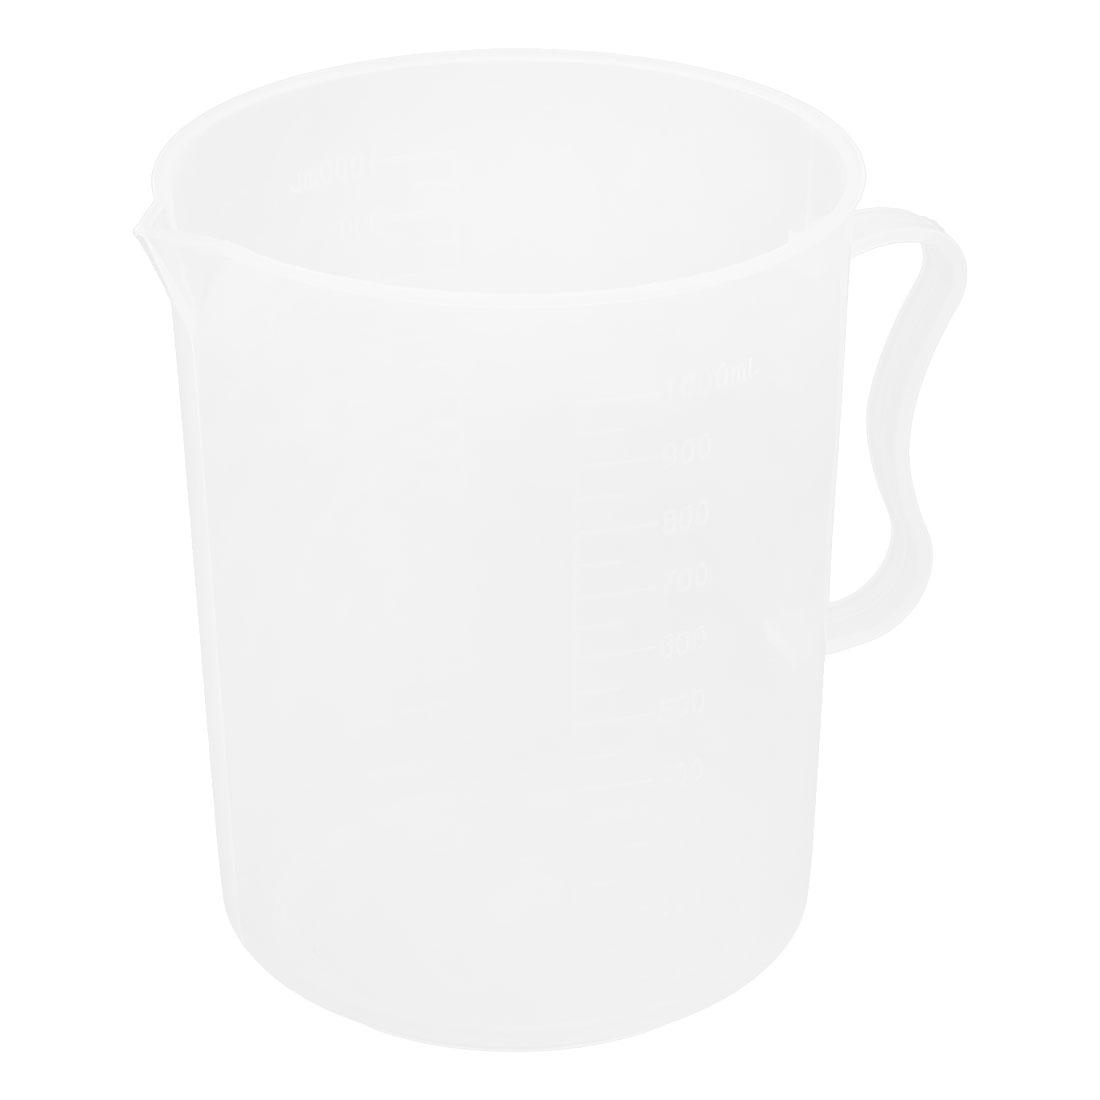 1000mL School Laboratory Liquid Container Volume Measuring Cup Beaker